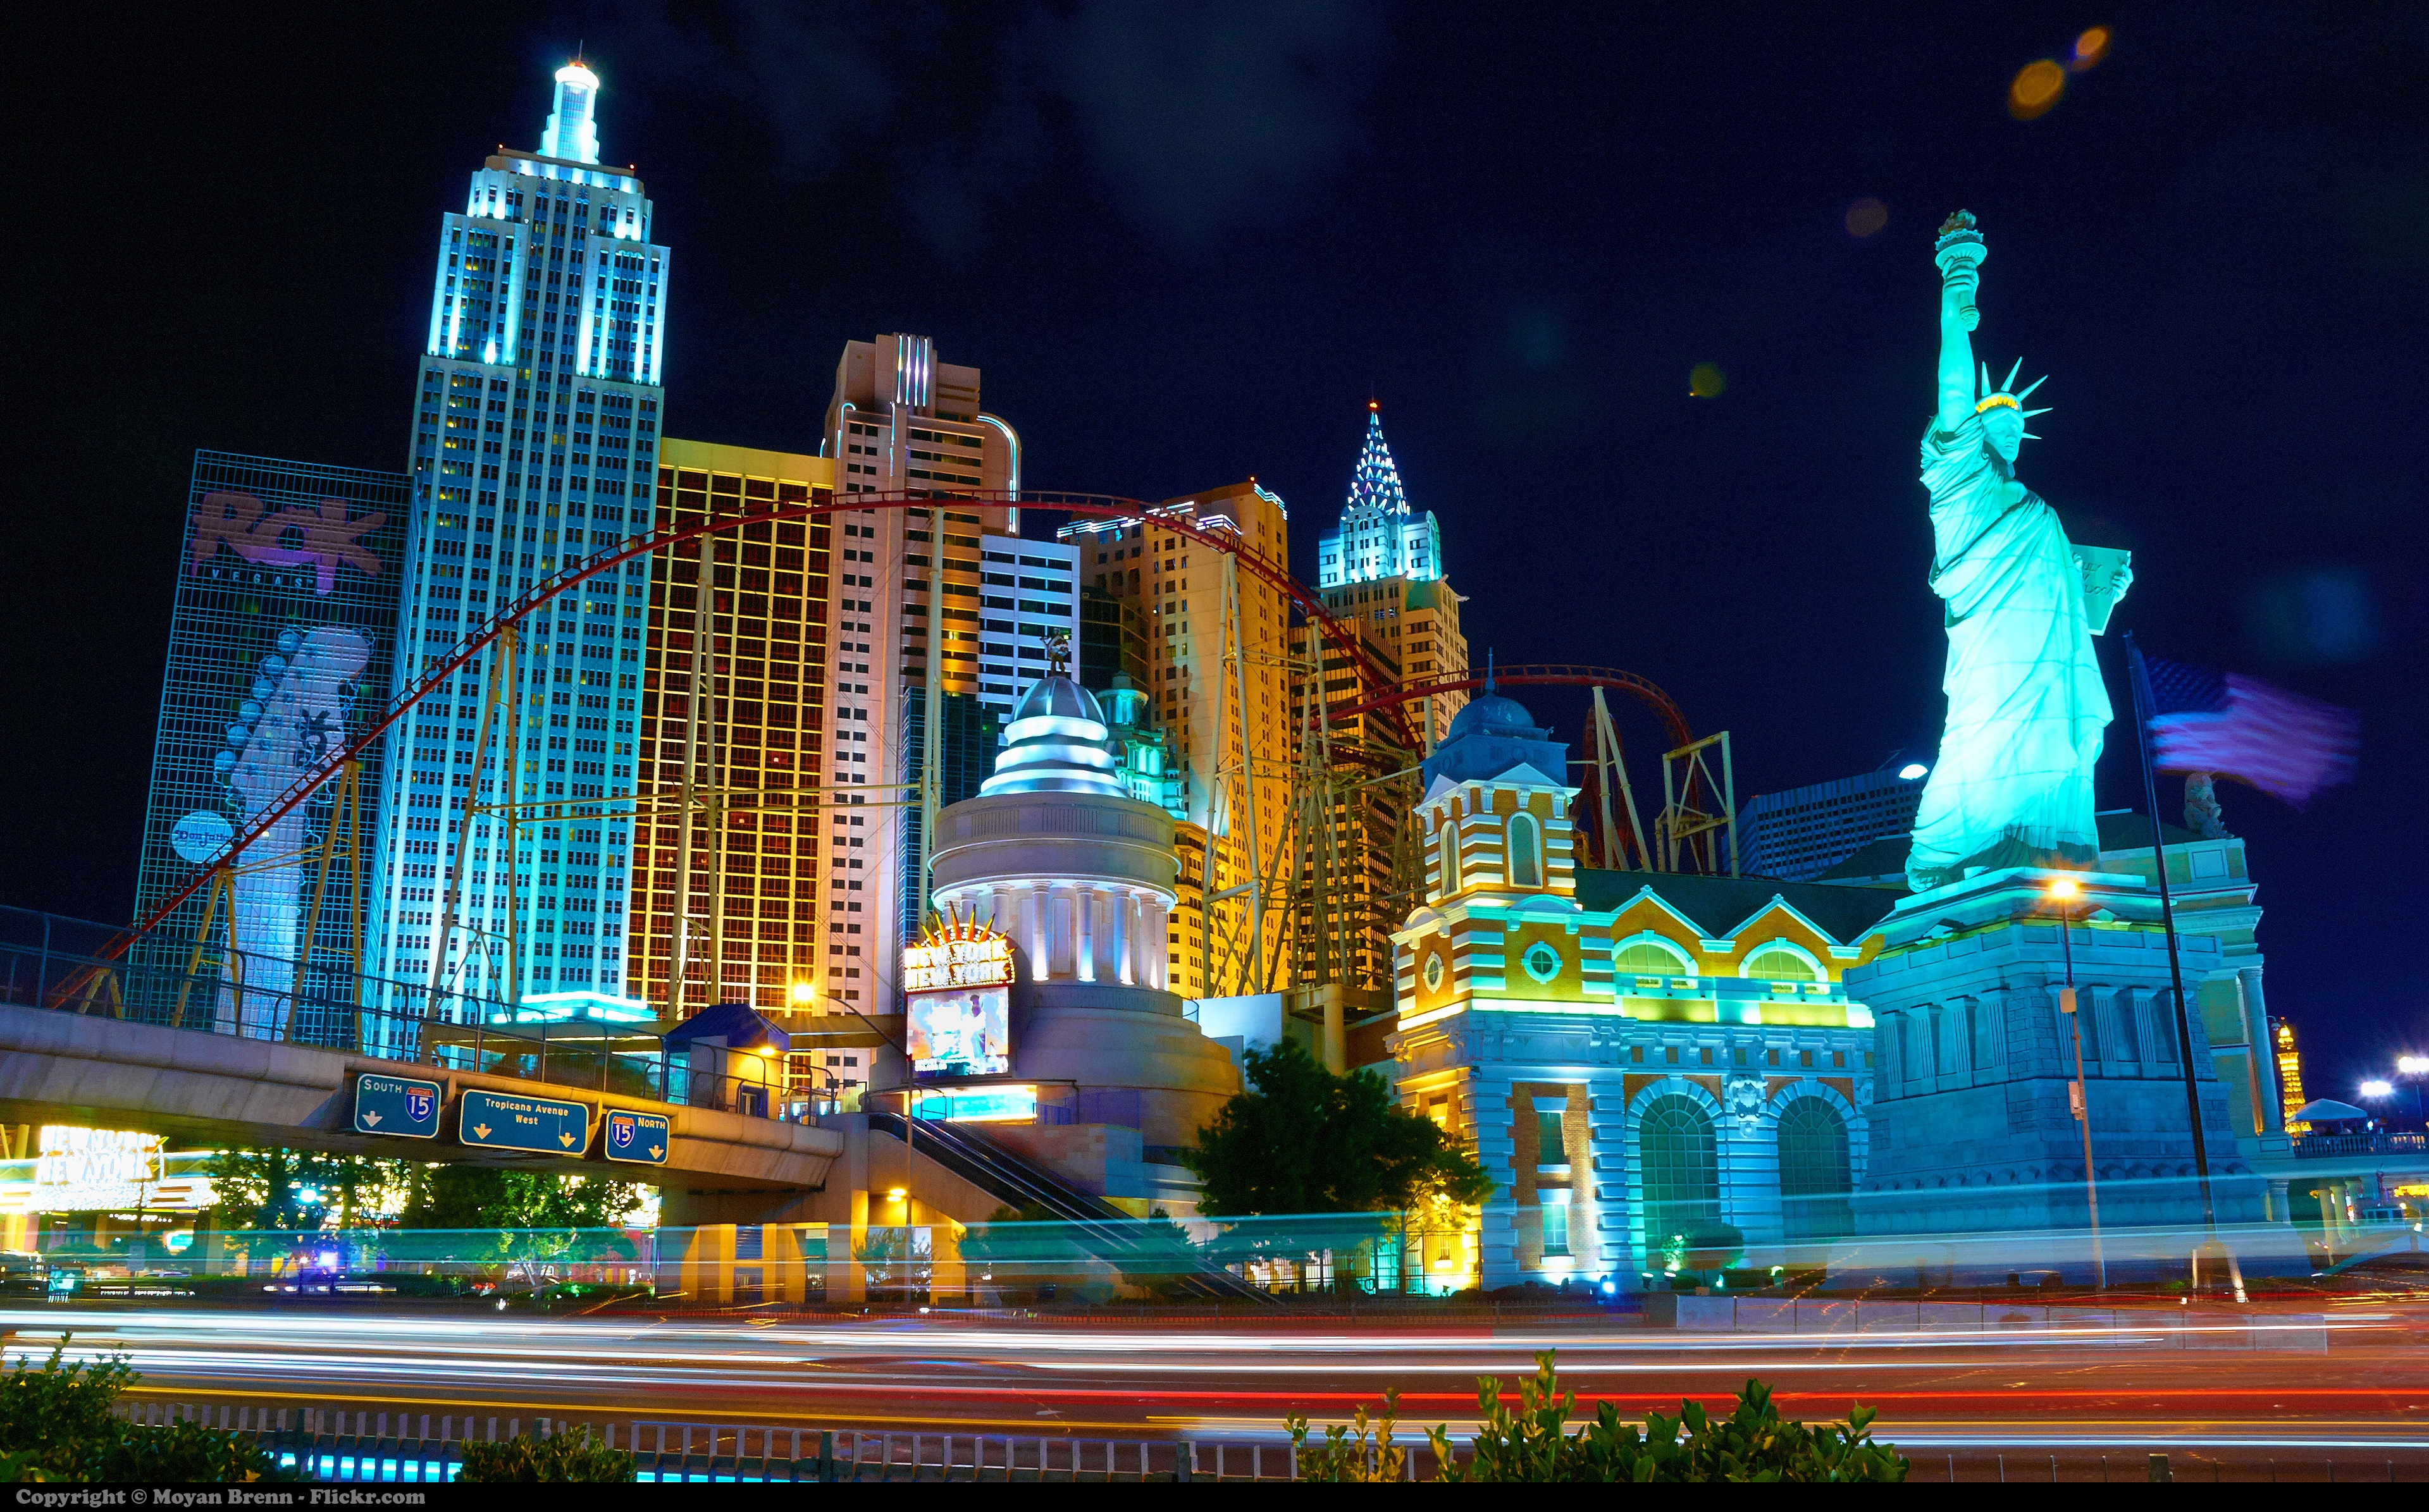 Hyatt Place Las Vegas - Las Vegas Hotels Off the Strip